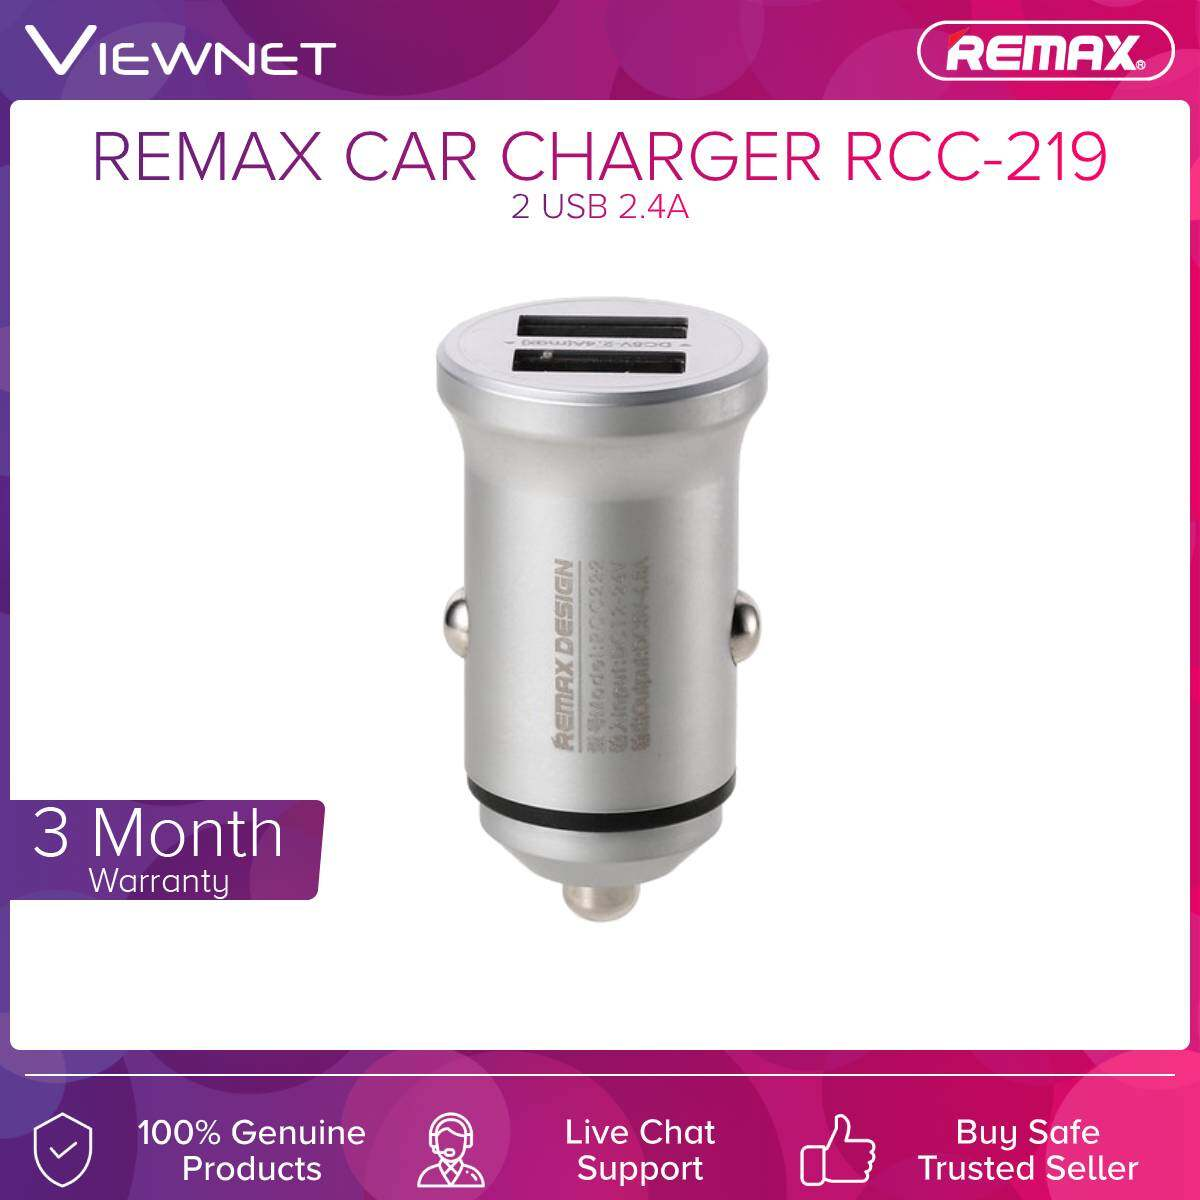 Remax Car Charger Alloy Series 2-Usb 2.4A (RCC-222)